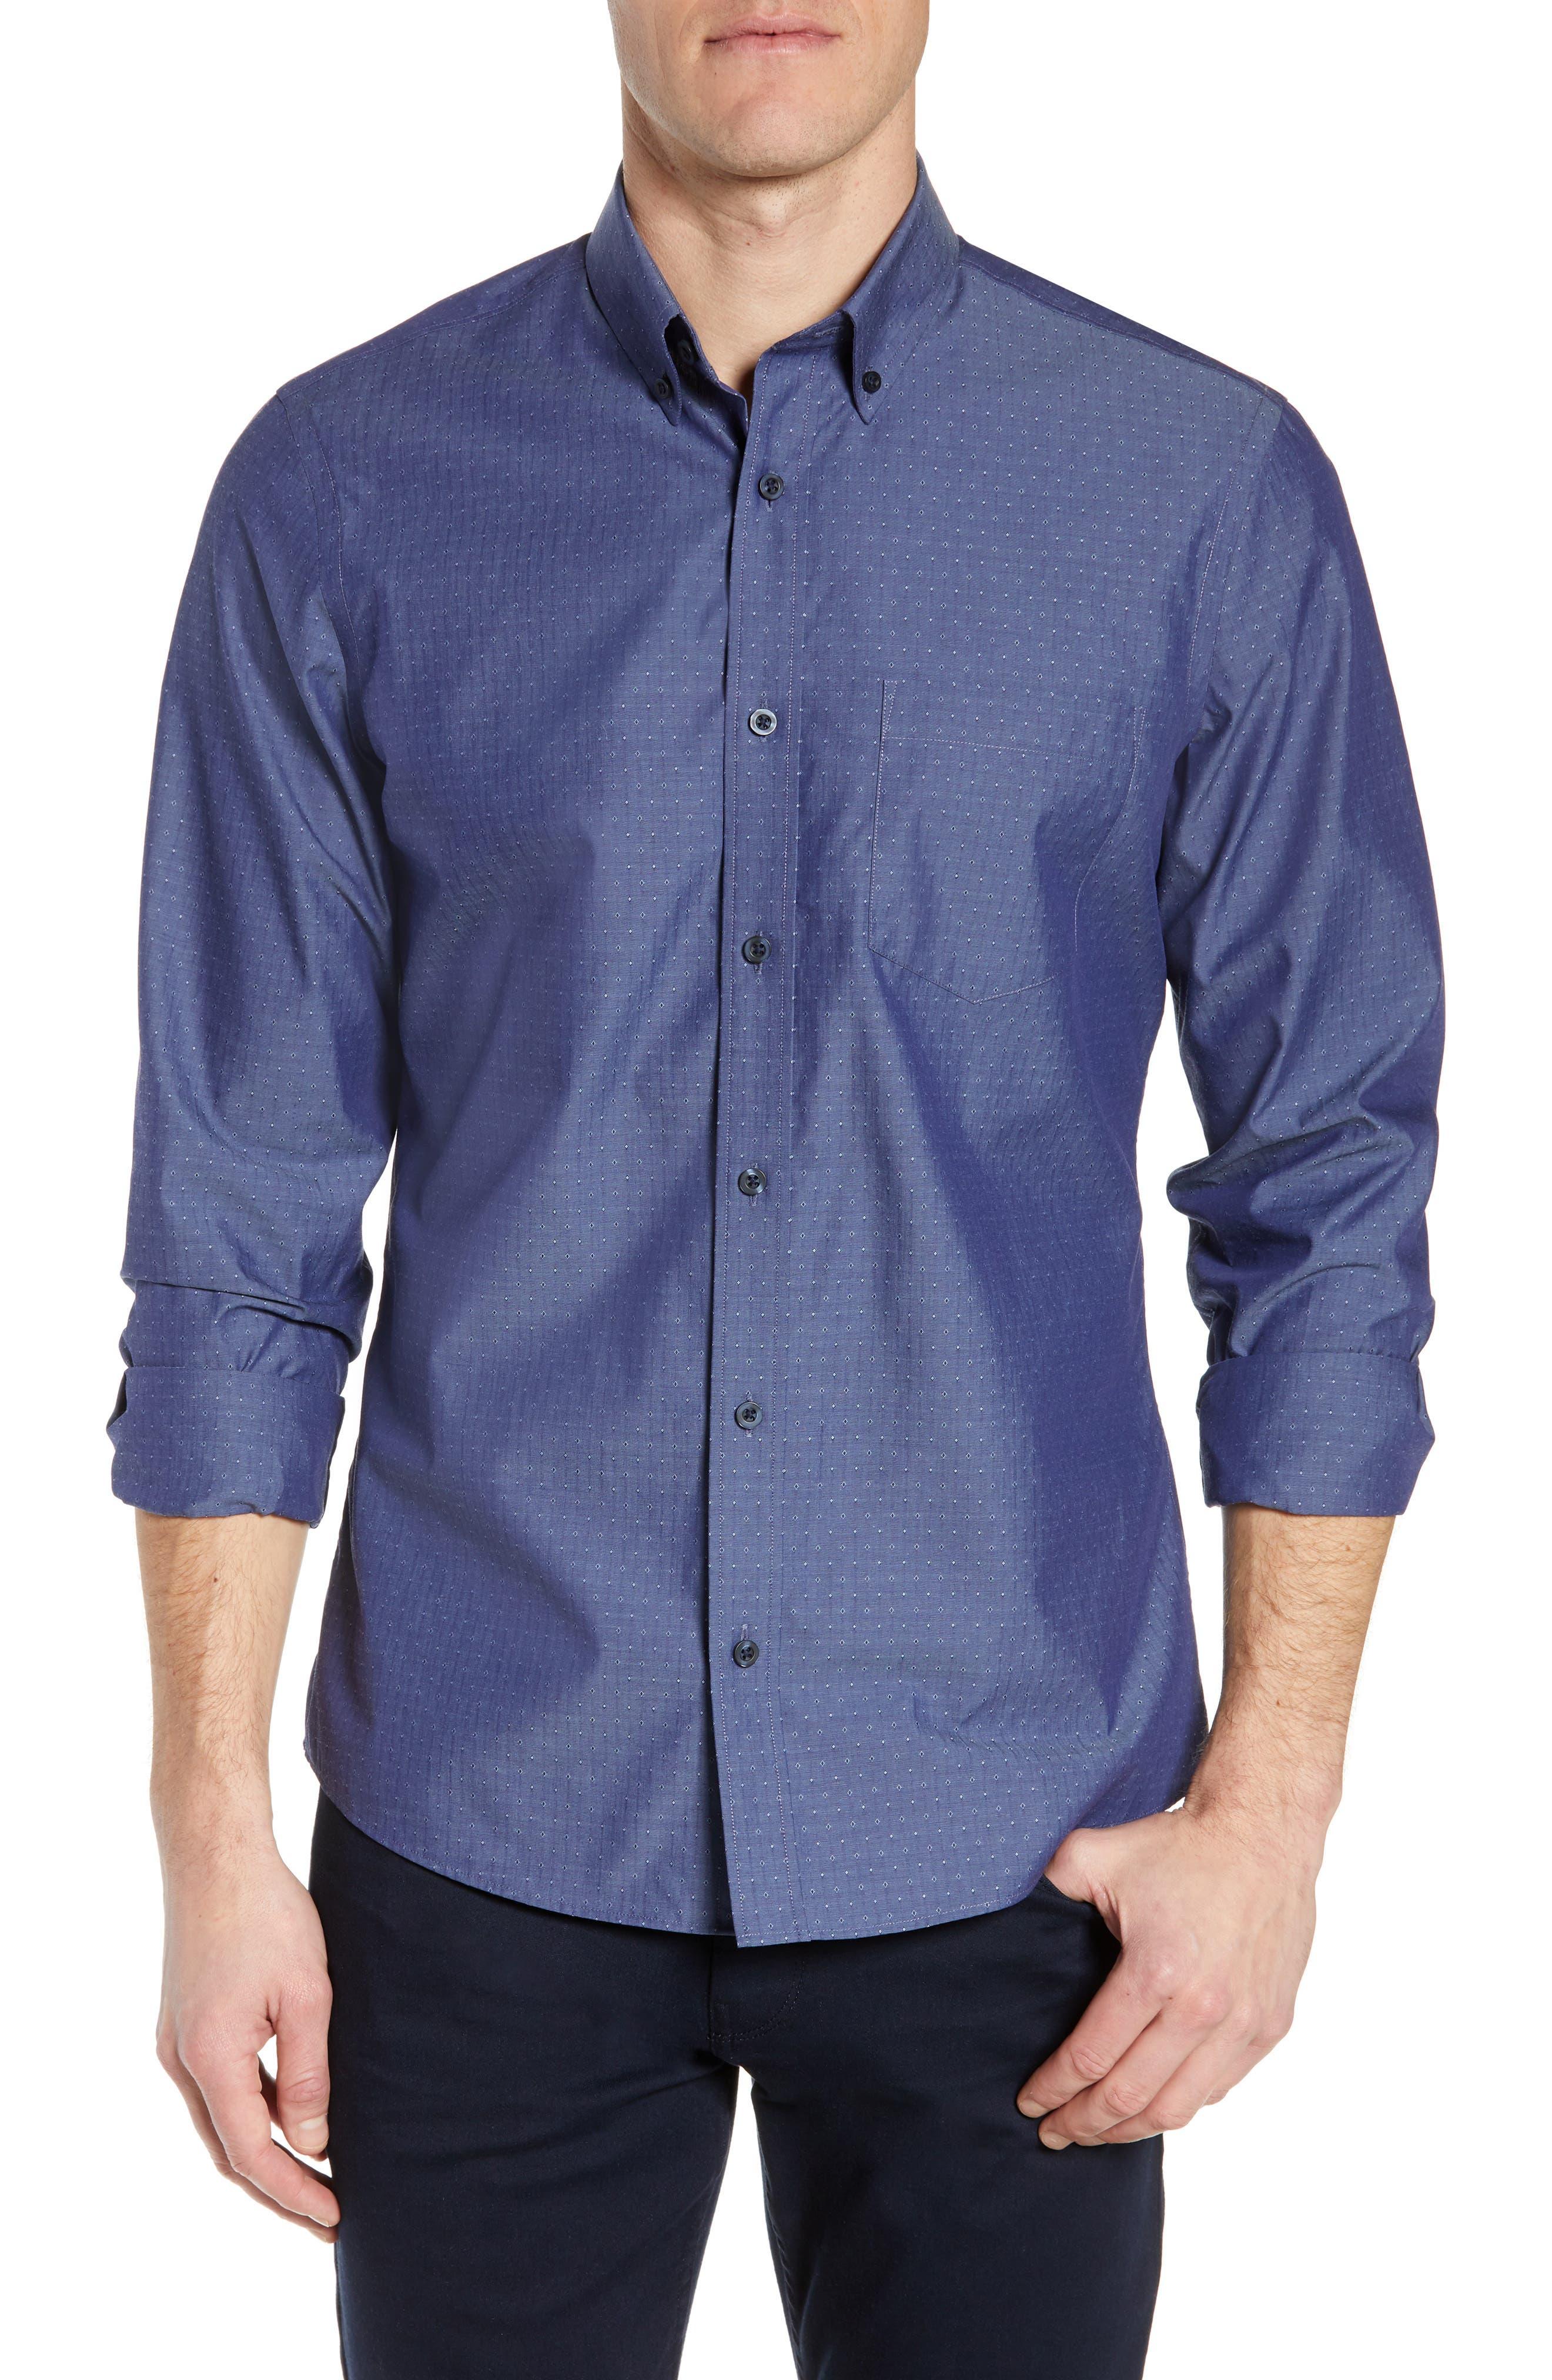 NORDSTROM MEN'S SHOP Regular Fit Non-Iron Dobby Sport Shirt, Main, color, NAVY PEACOAT DIAMOND DOBBY